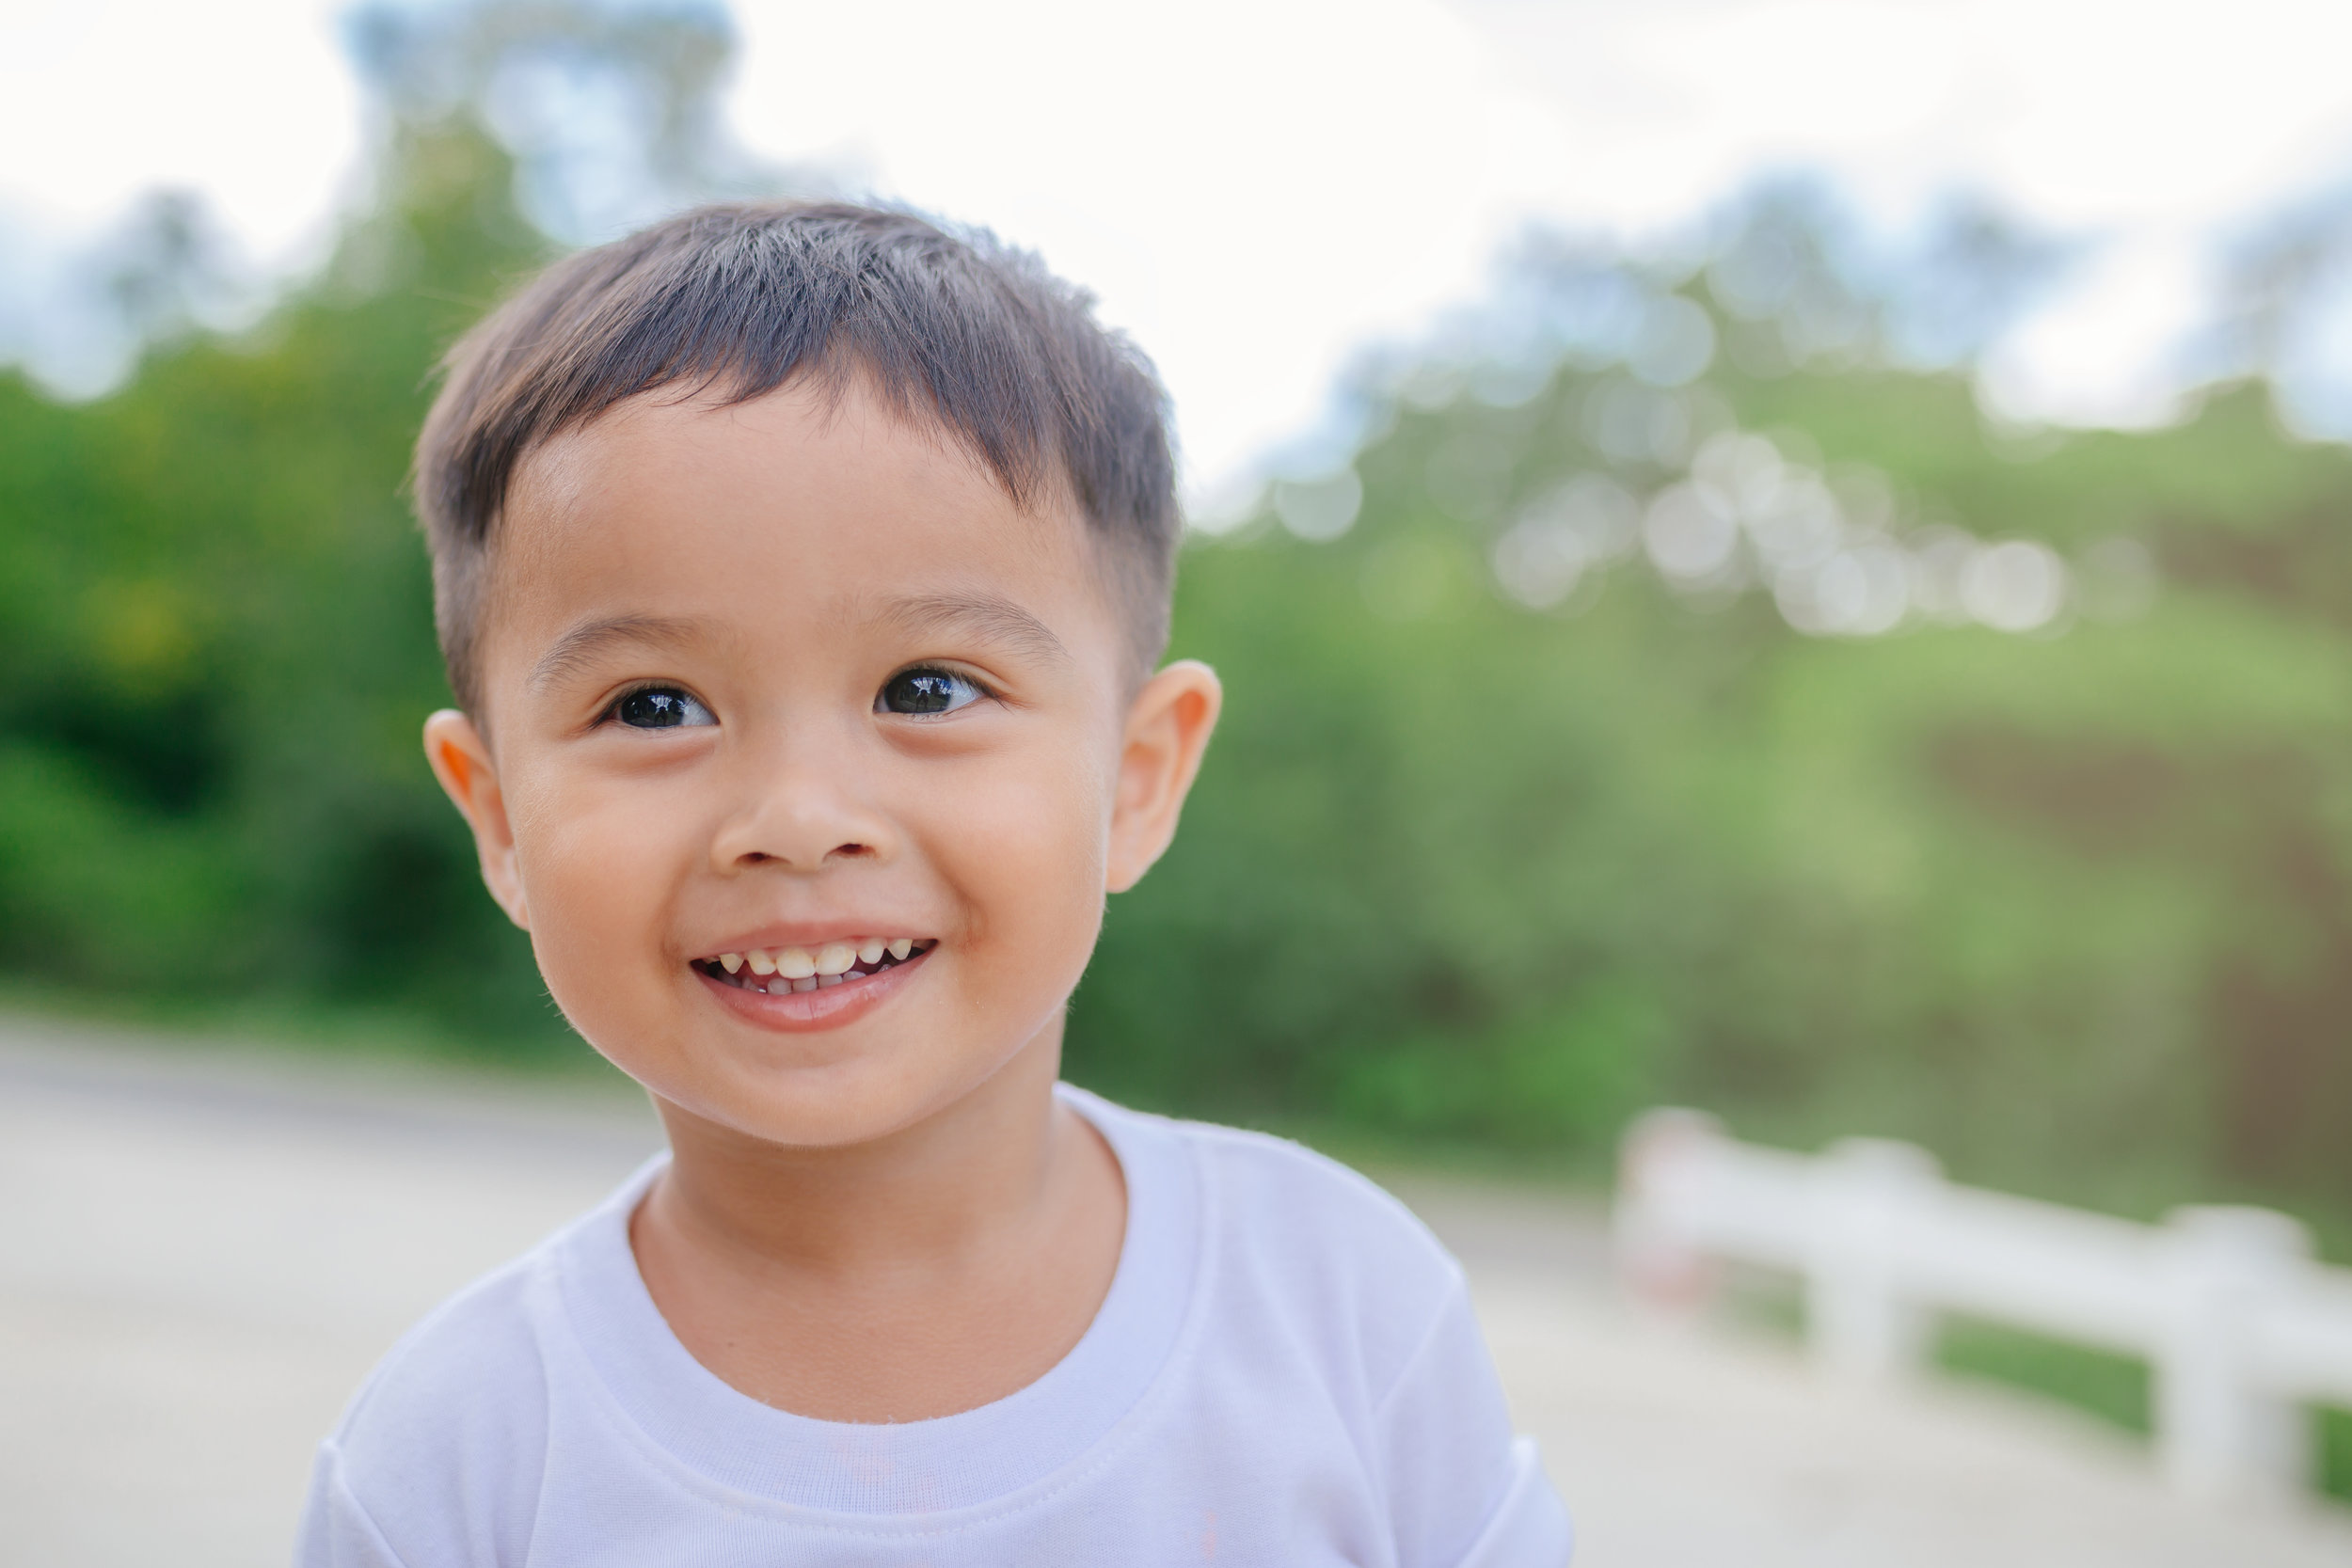 boy smiling.jpg